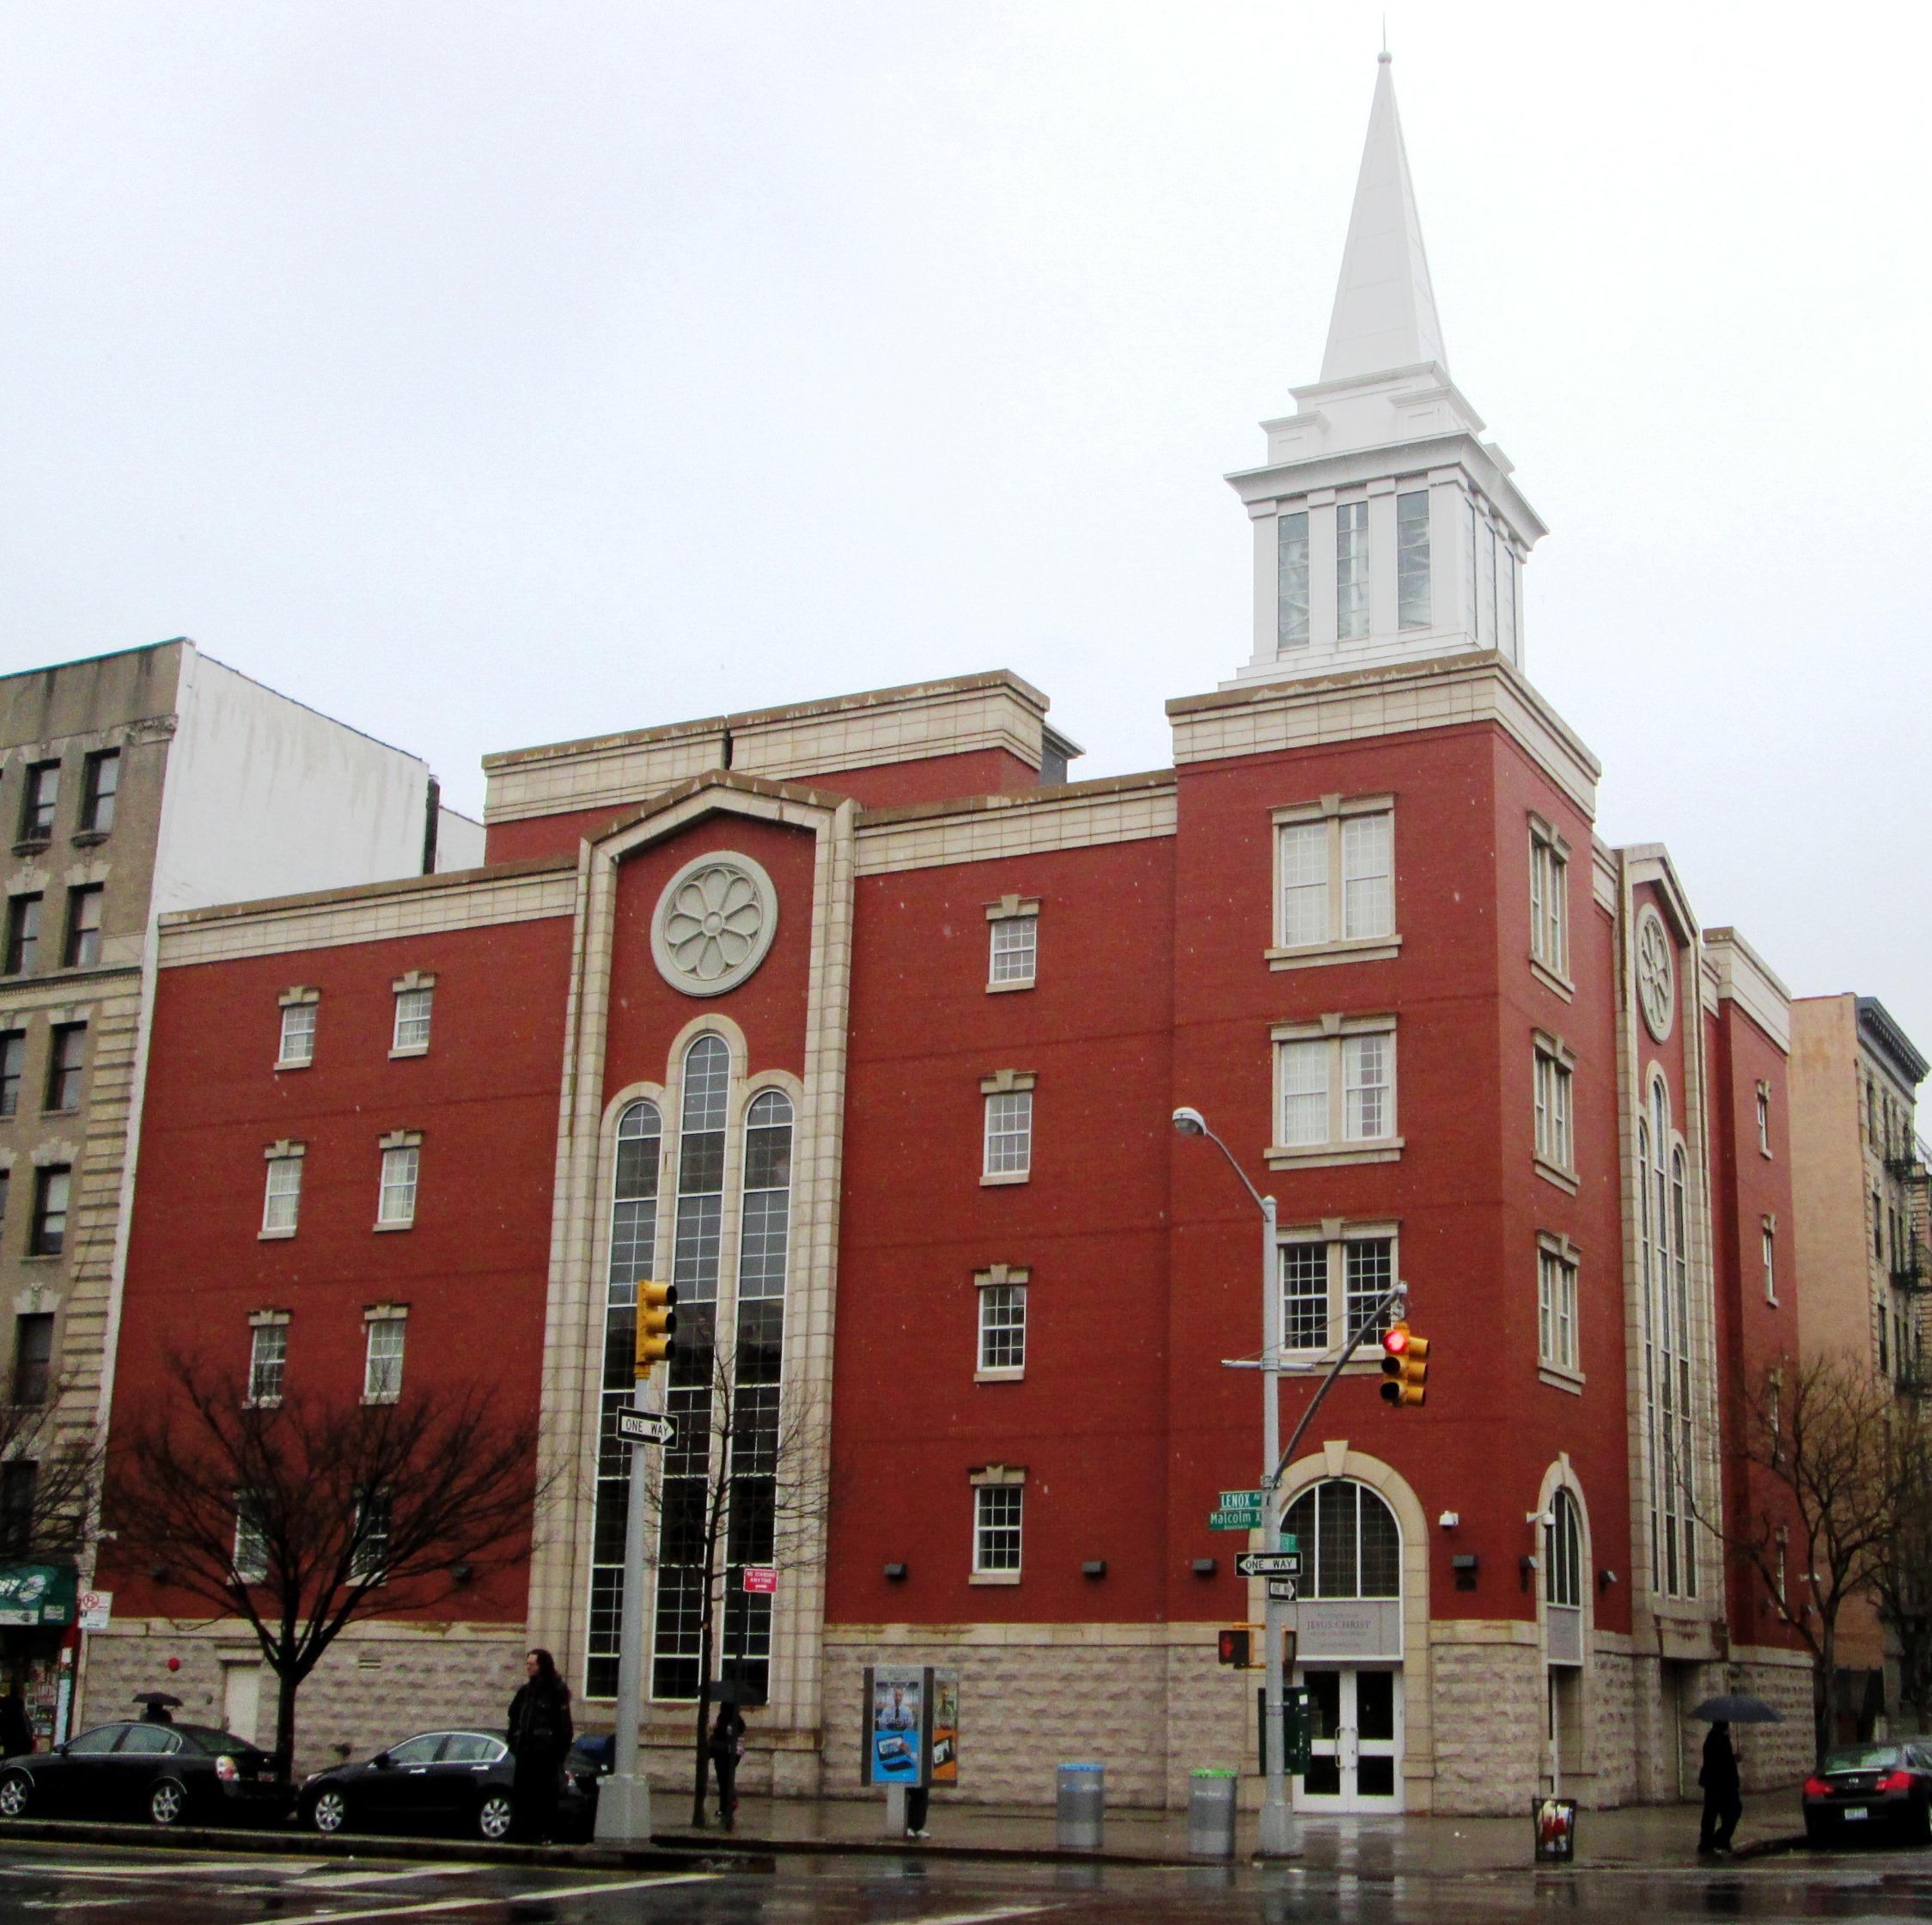 Church_of_Jesus_Christ_of_Latter-Day_Saints_Harlem_1st_Ward_360-68_Lenox_Avenue